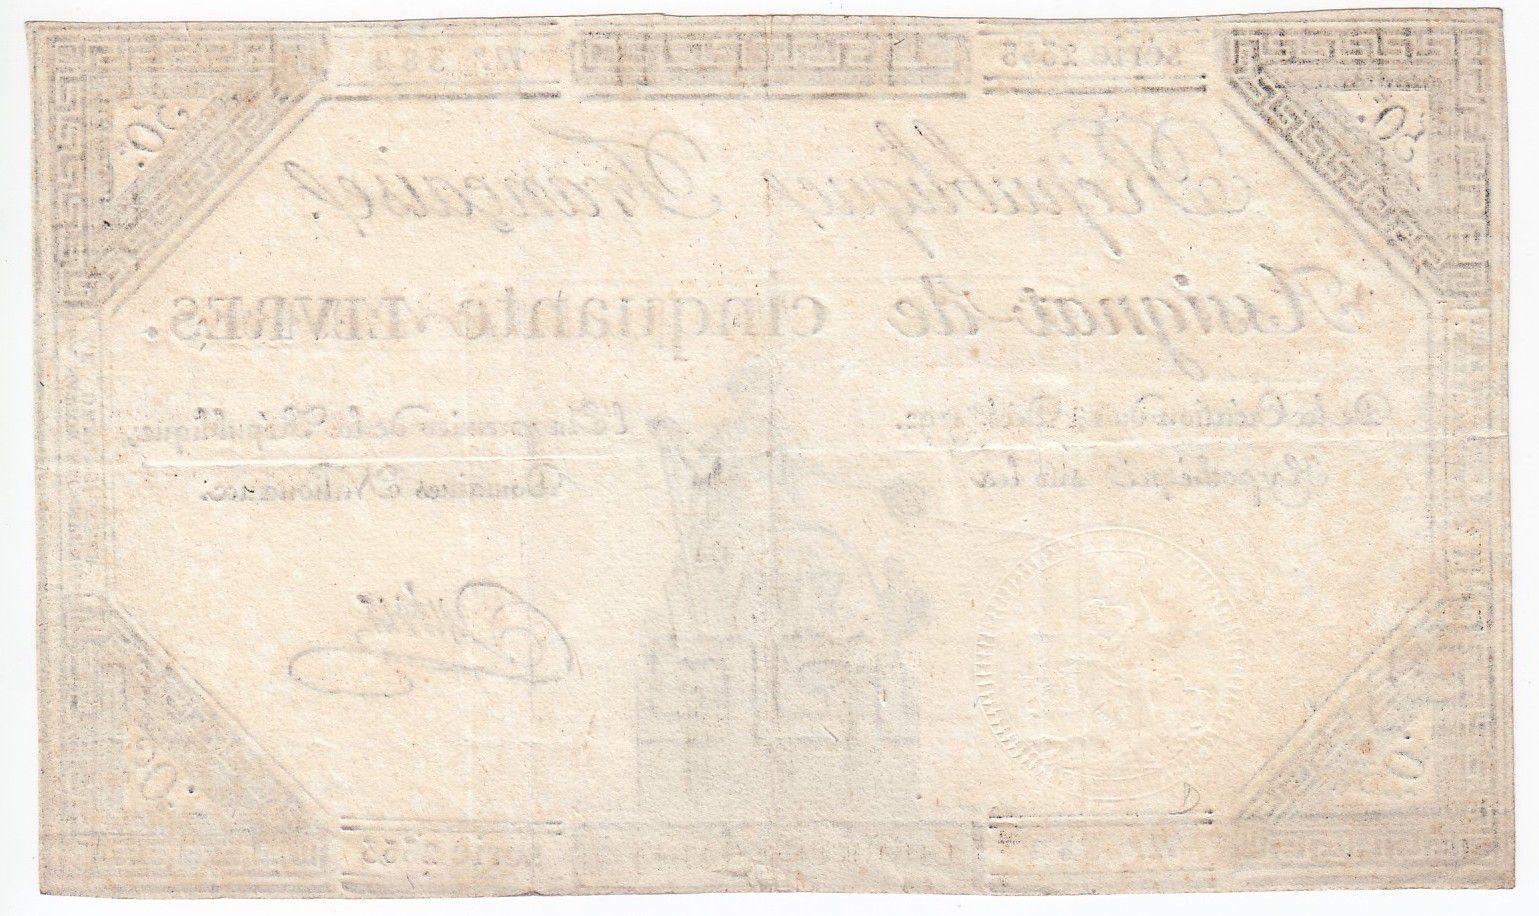 France 50 Livres France seated - 14-12-1792 - Sign. Dubois - XF